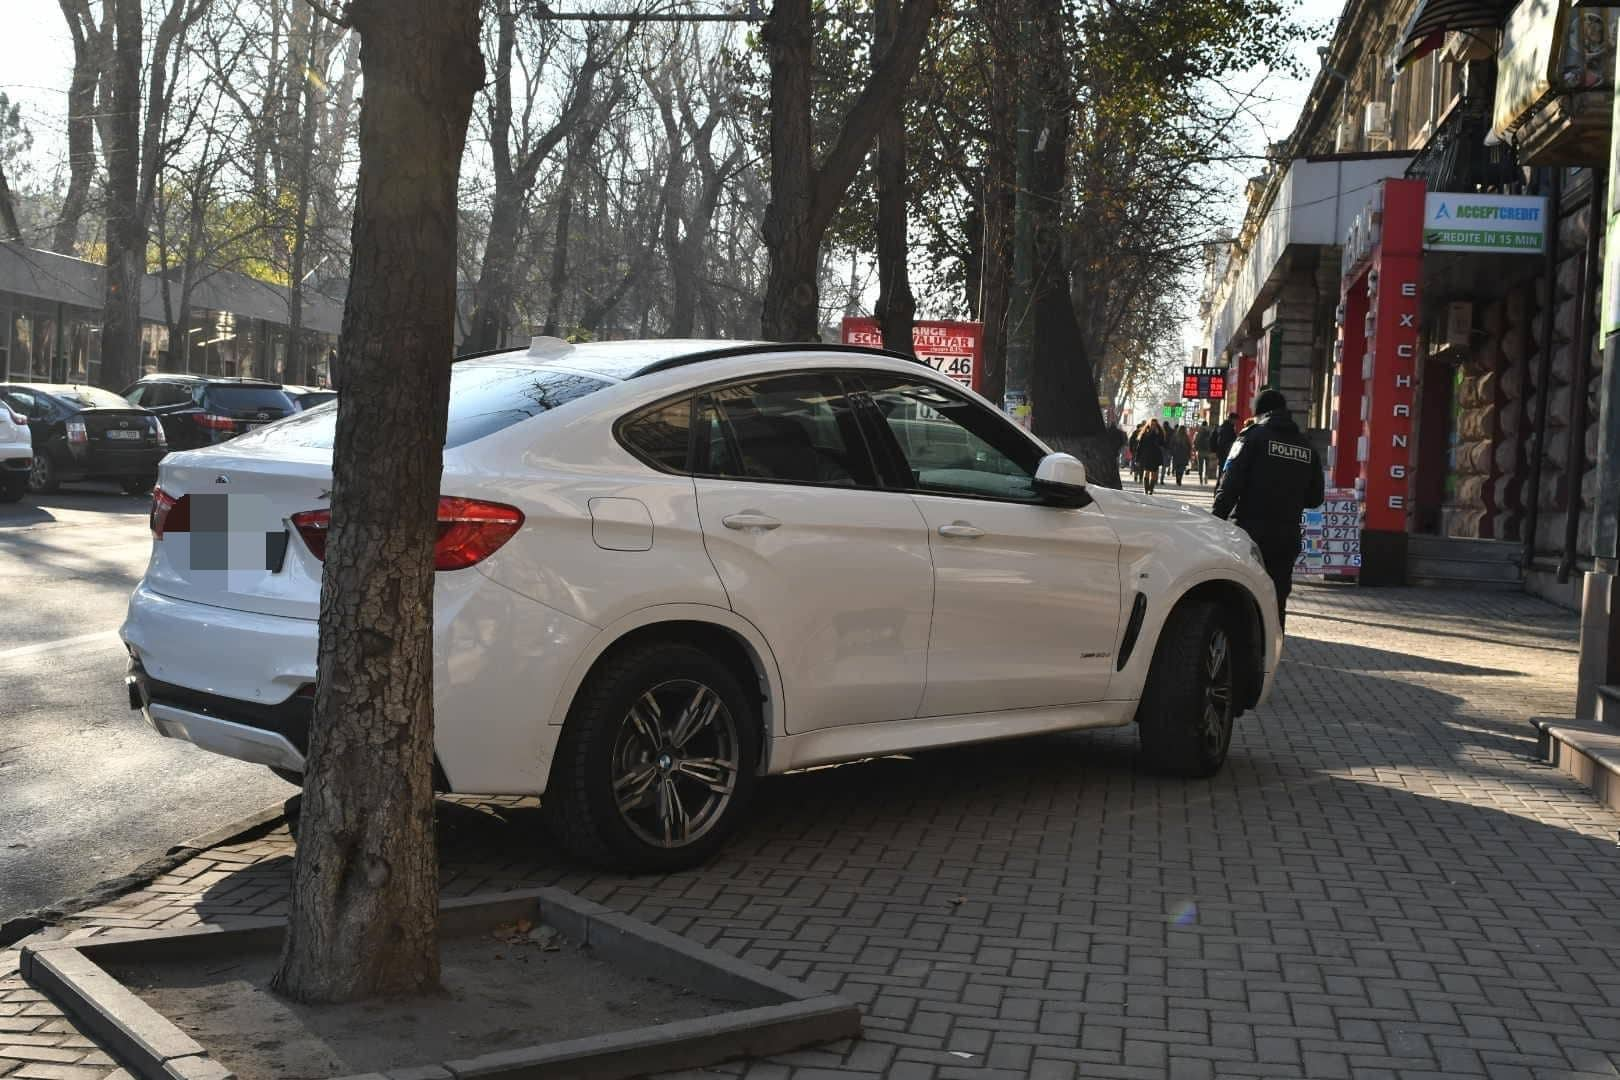 Nadejda Roșcovanu/Jurnal.md